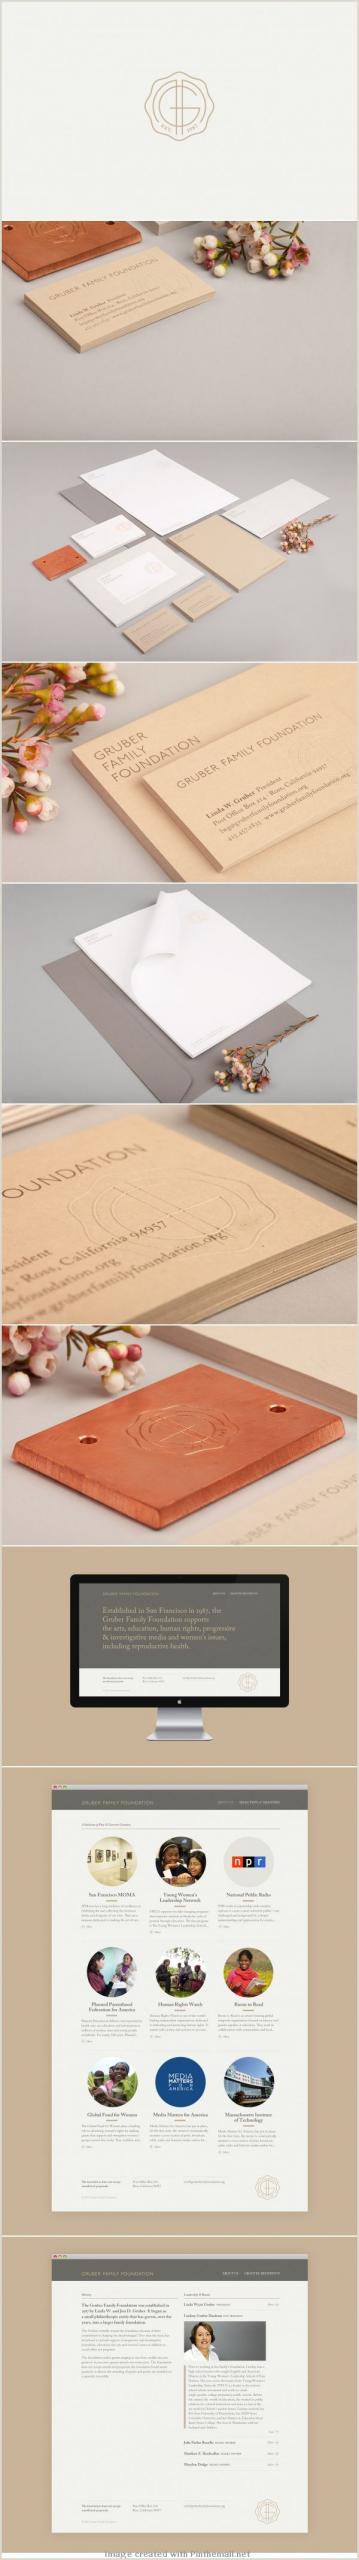 Best Inexpensive Business Cards 14 Popular Hardwood Flooring Business Card Template